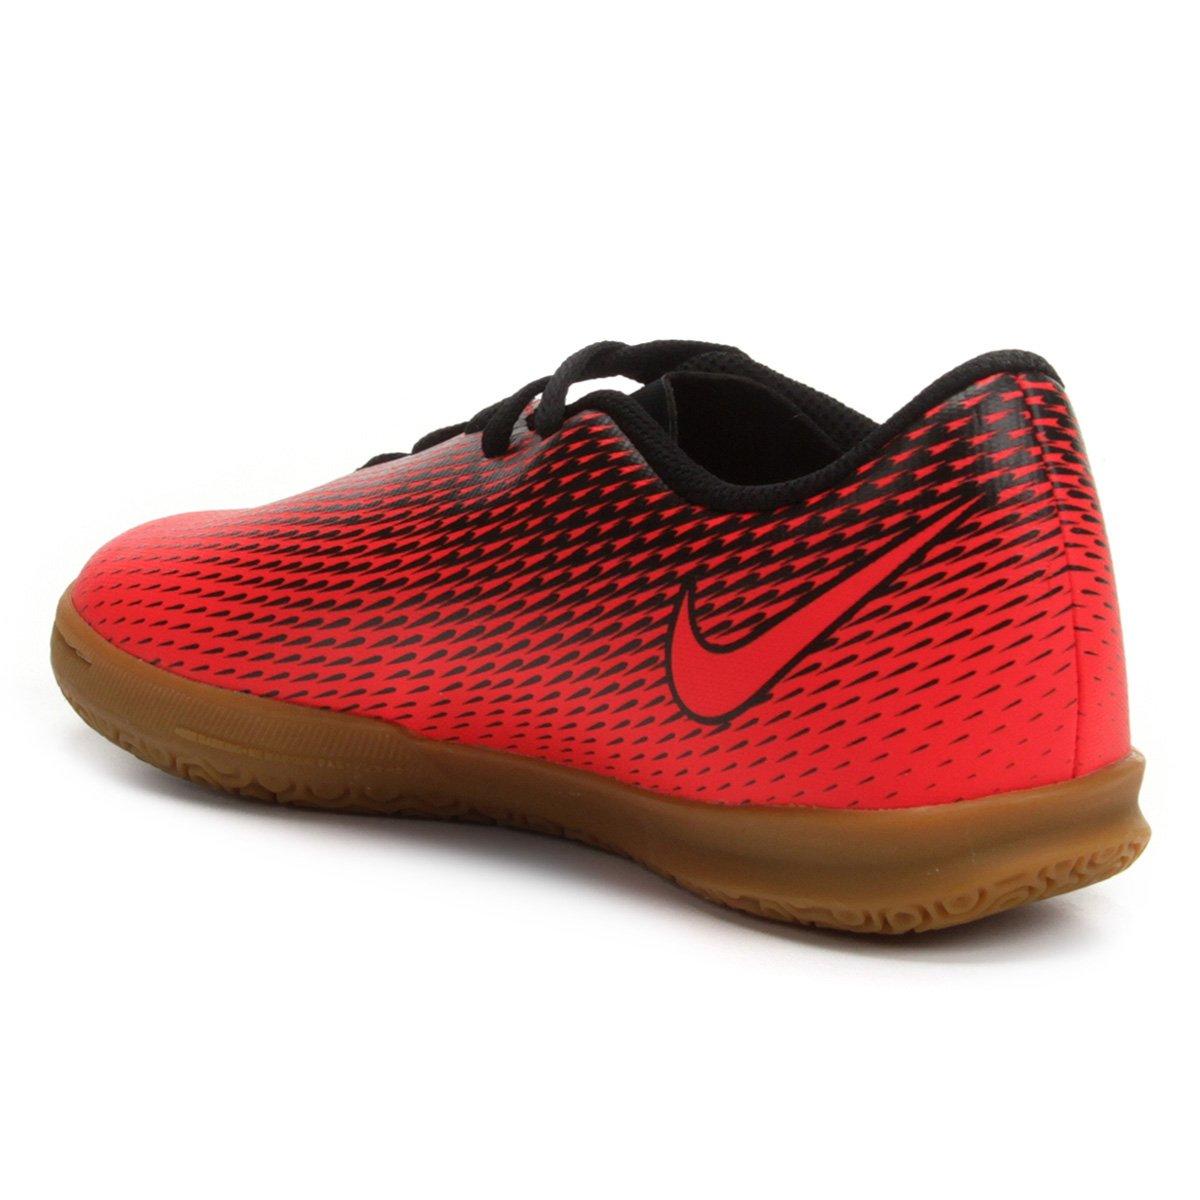 377f8fb9ed Chuteira Futsal Infantil Nike Bravata 2 IC - Vermelho - Compre Agora ...